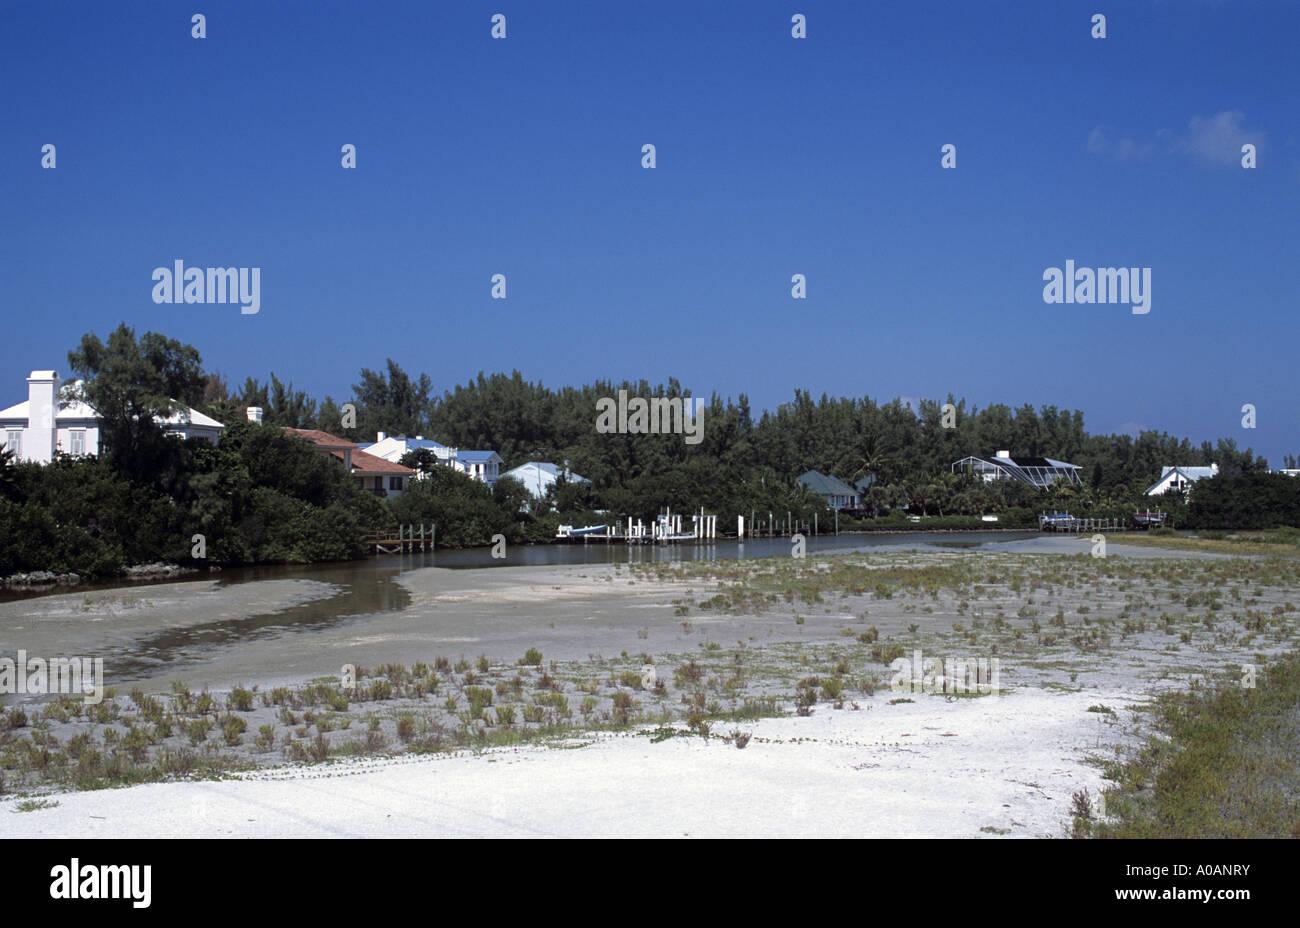 Florida Captiva Island Insel Florida US USA United States Vereinigte Staaten Staat Of Von America Amerika Stock Photo